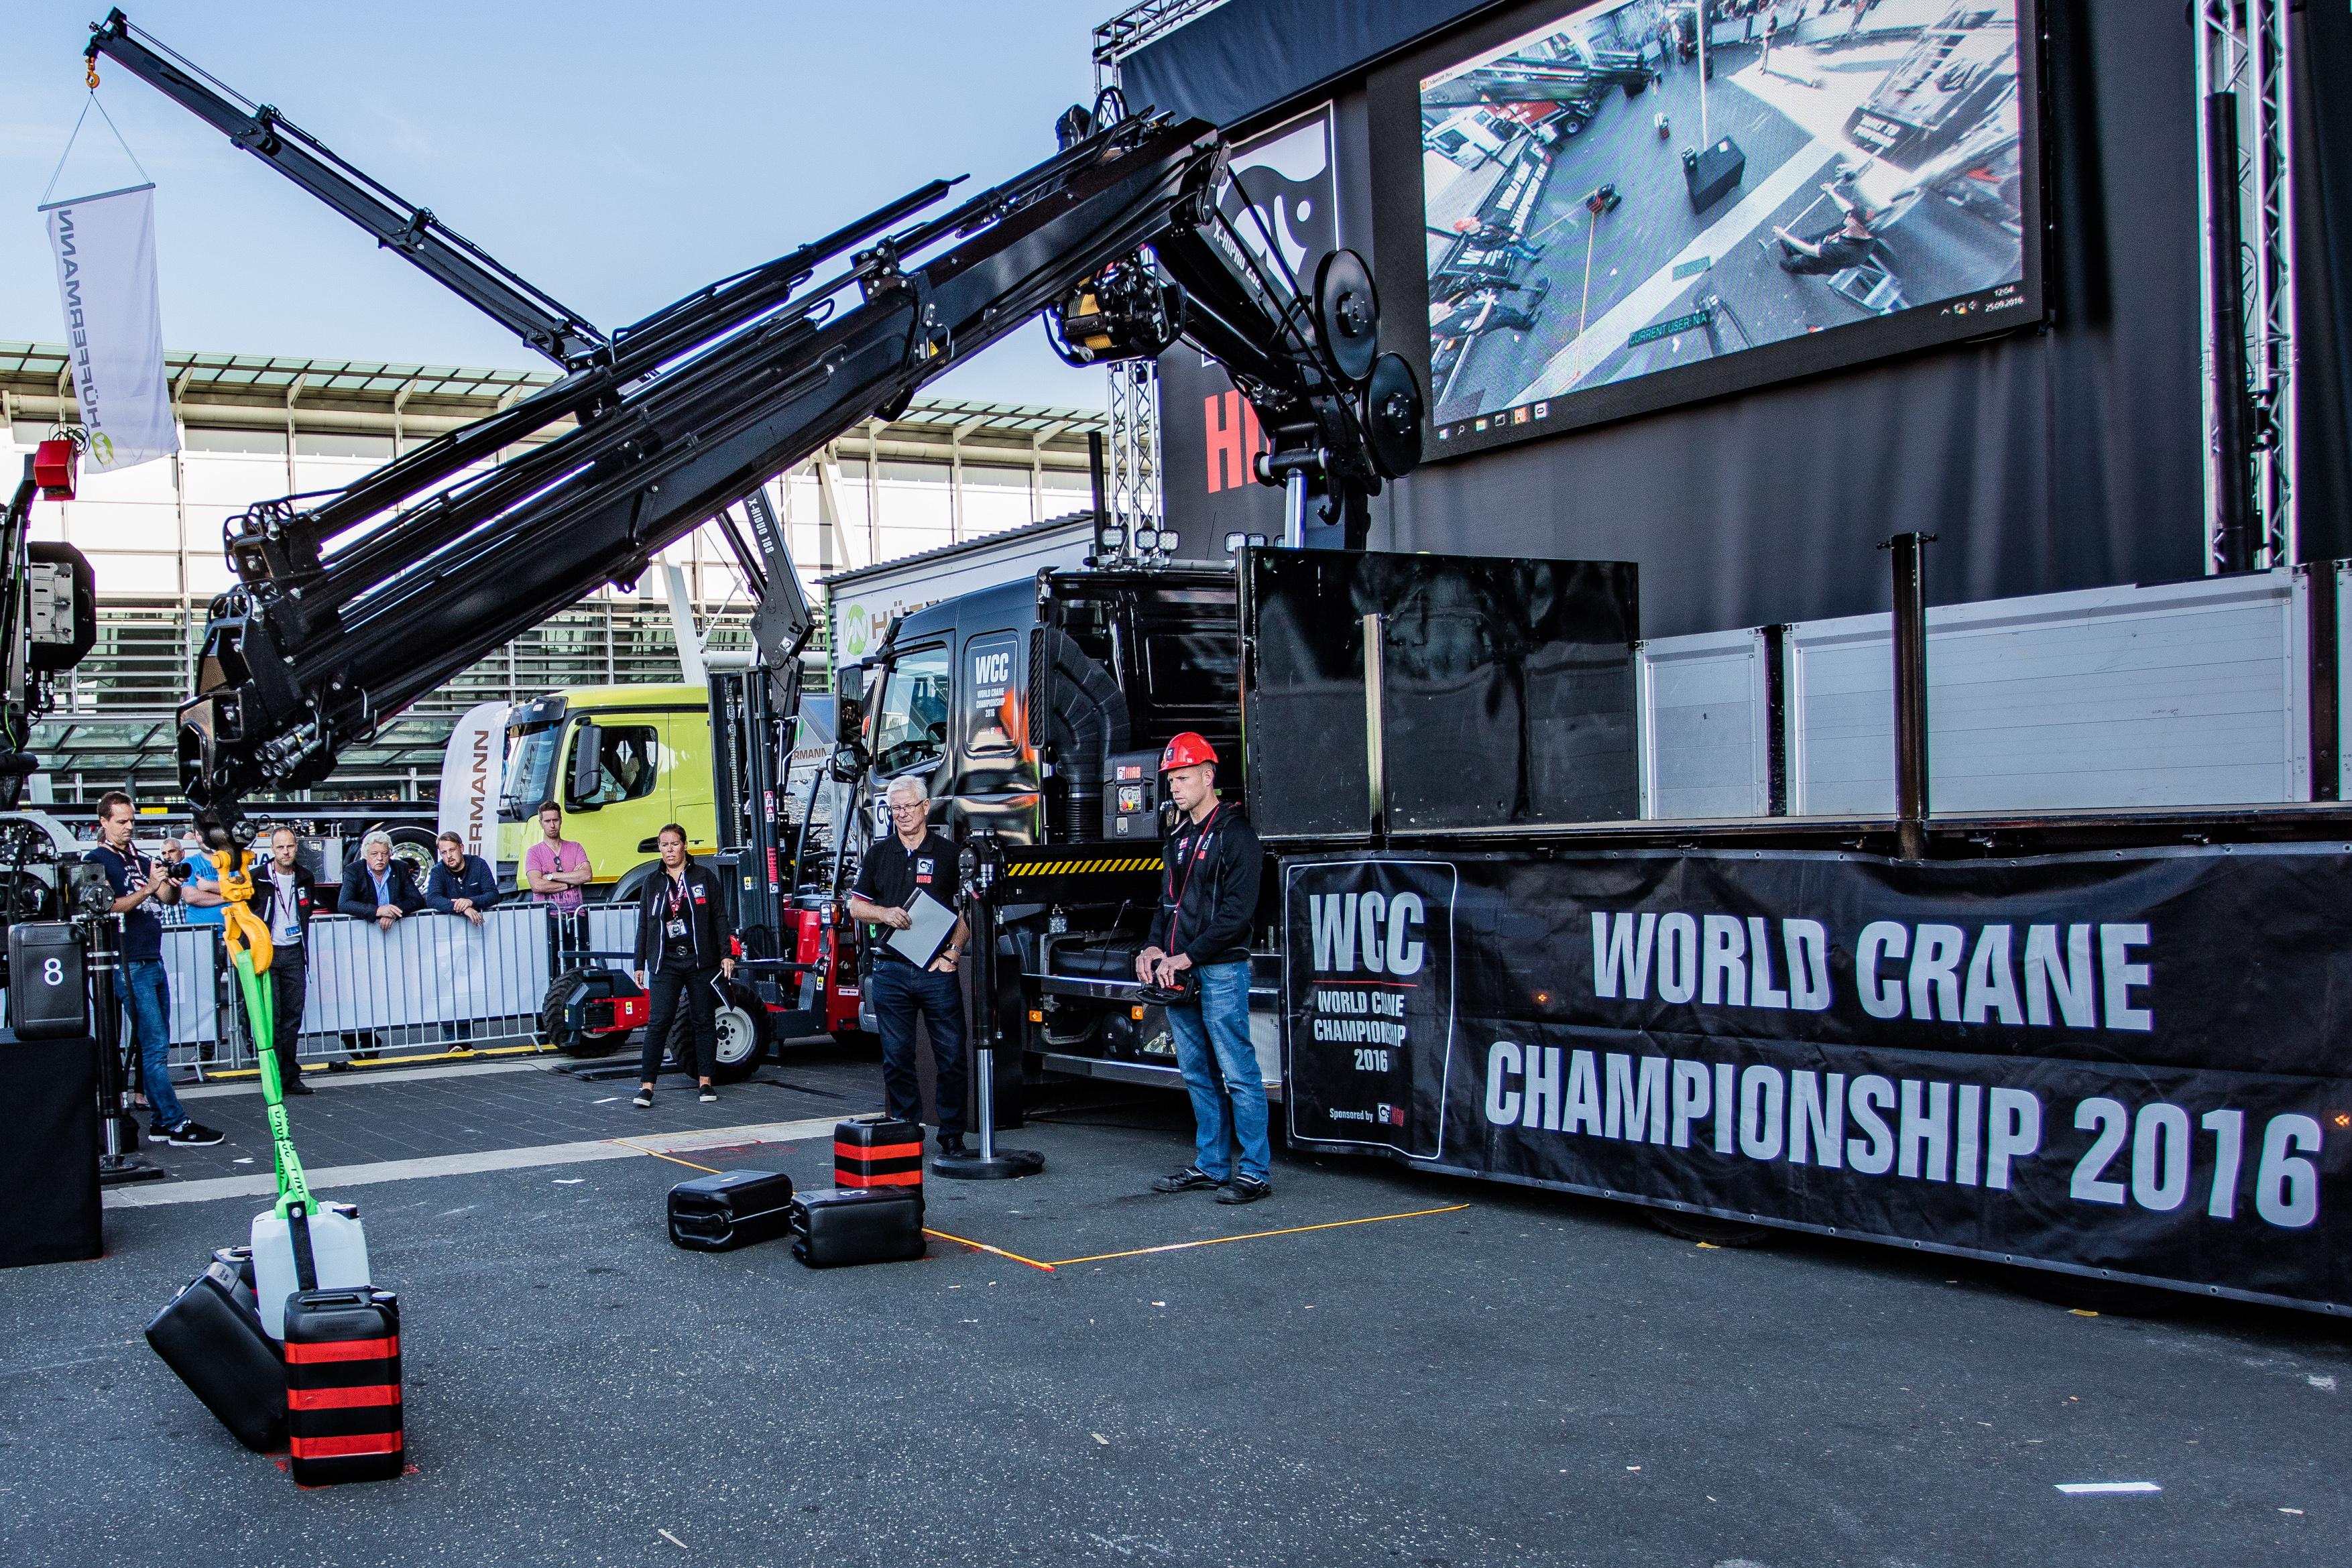 Tim Hansen at World Crane Championships at IAA 2016